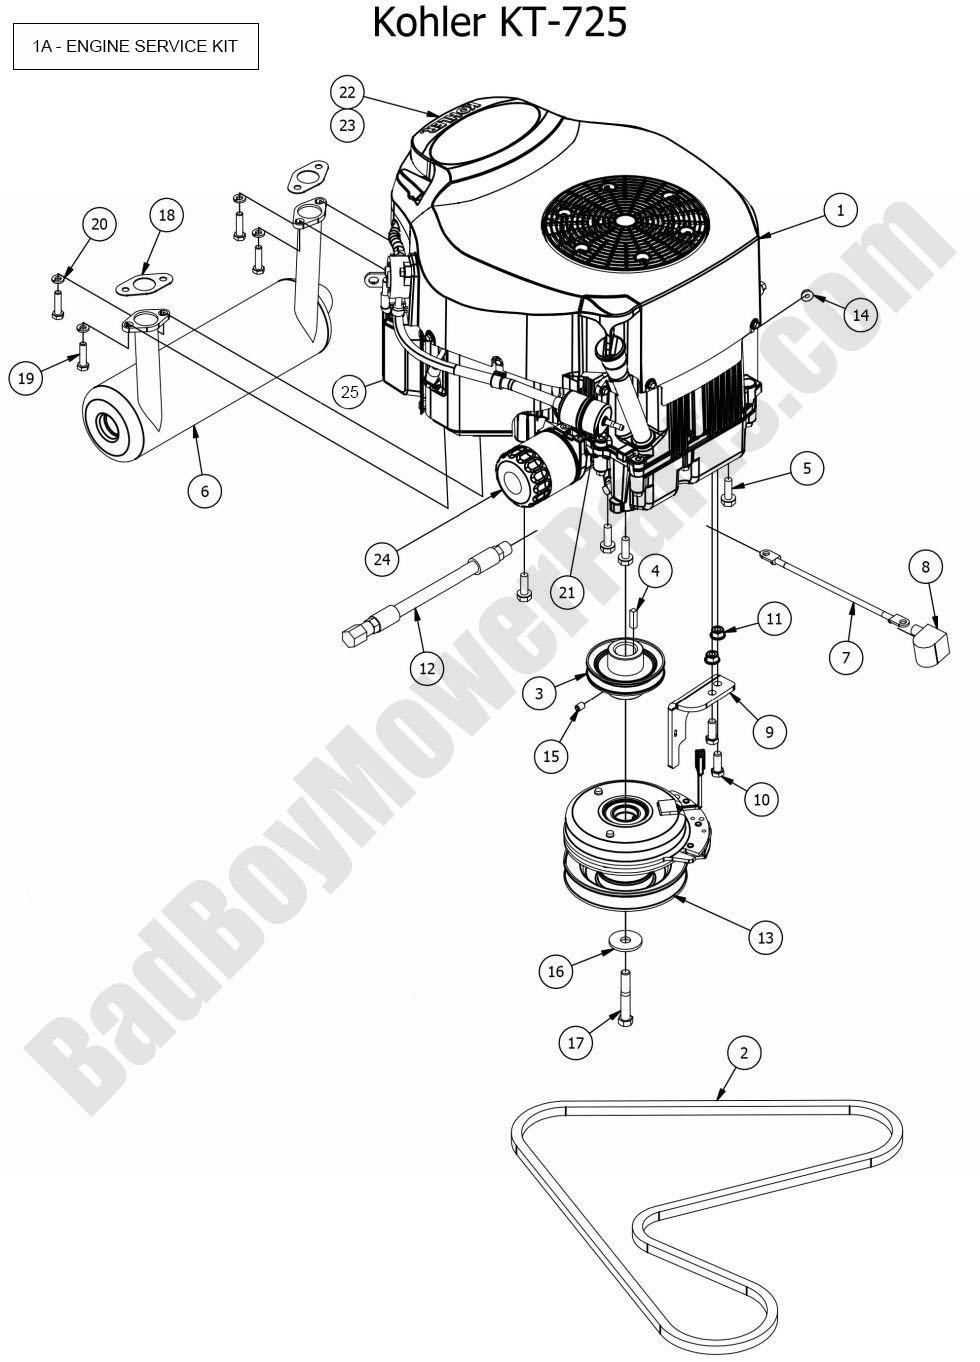 2015 mz engine kohler kt 725 diagram wiring diagram